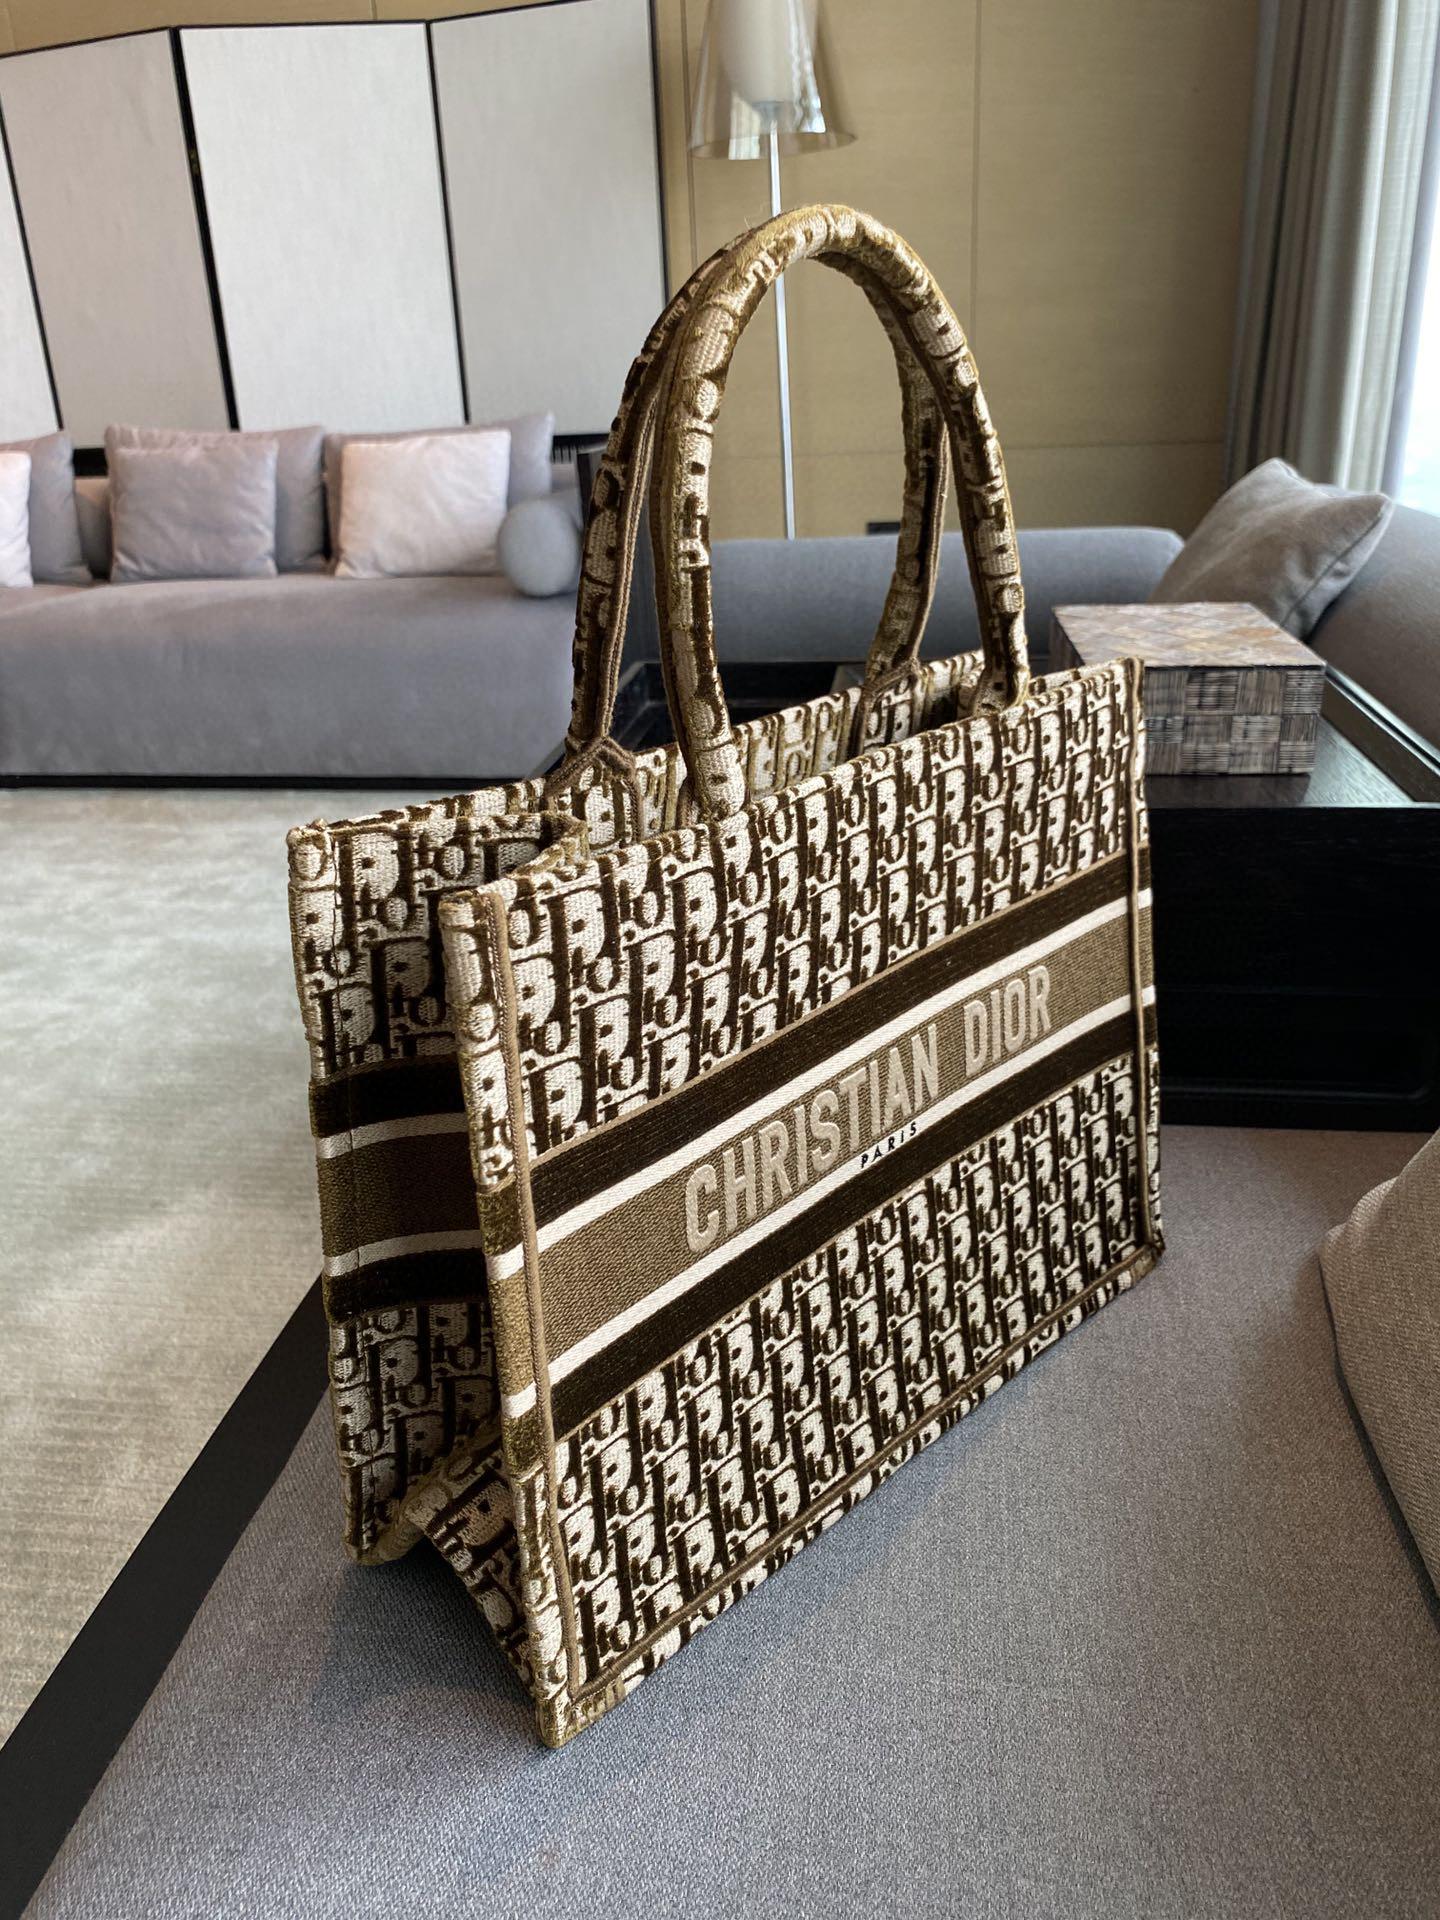 Dior 迪奥 购物袋 丝绒咖色 小号/36.5cm